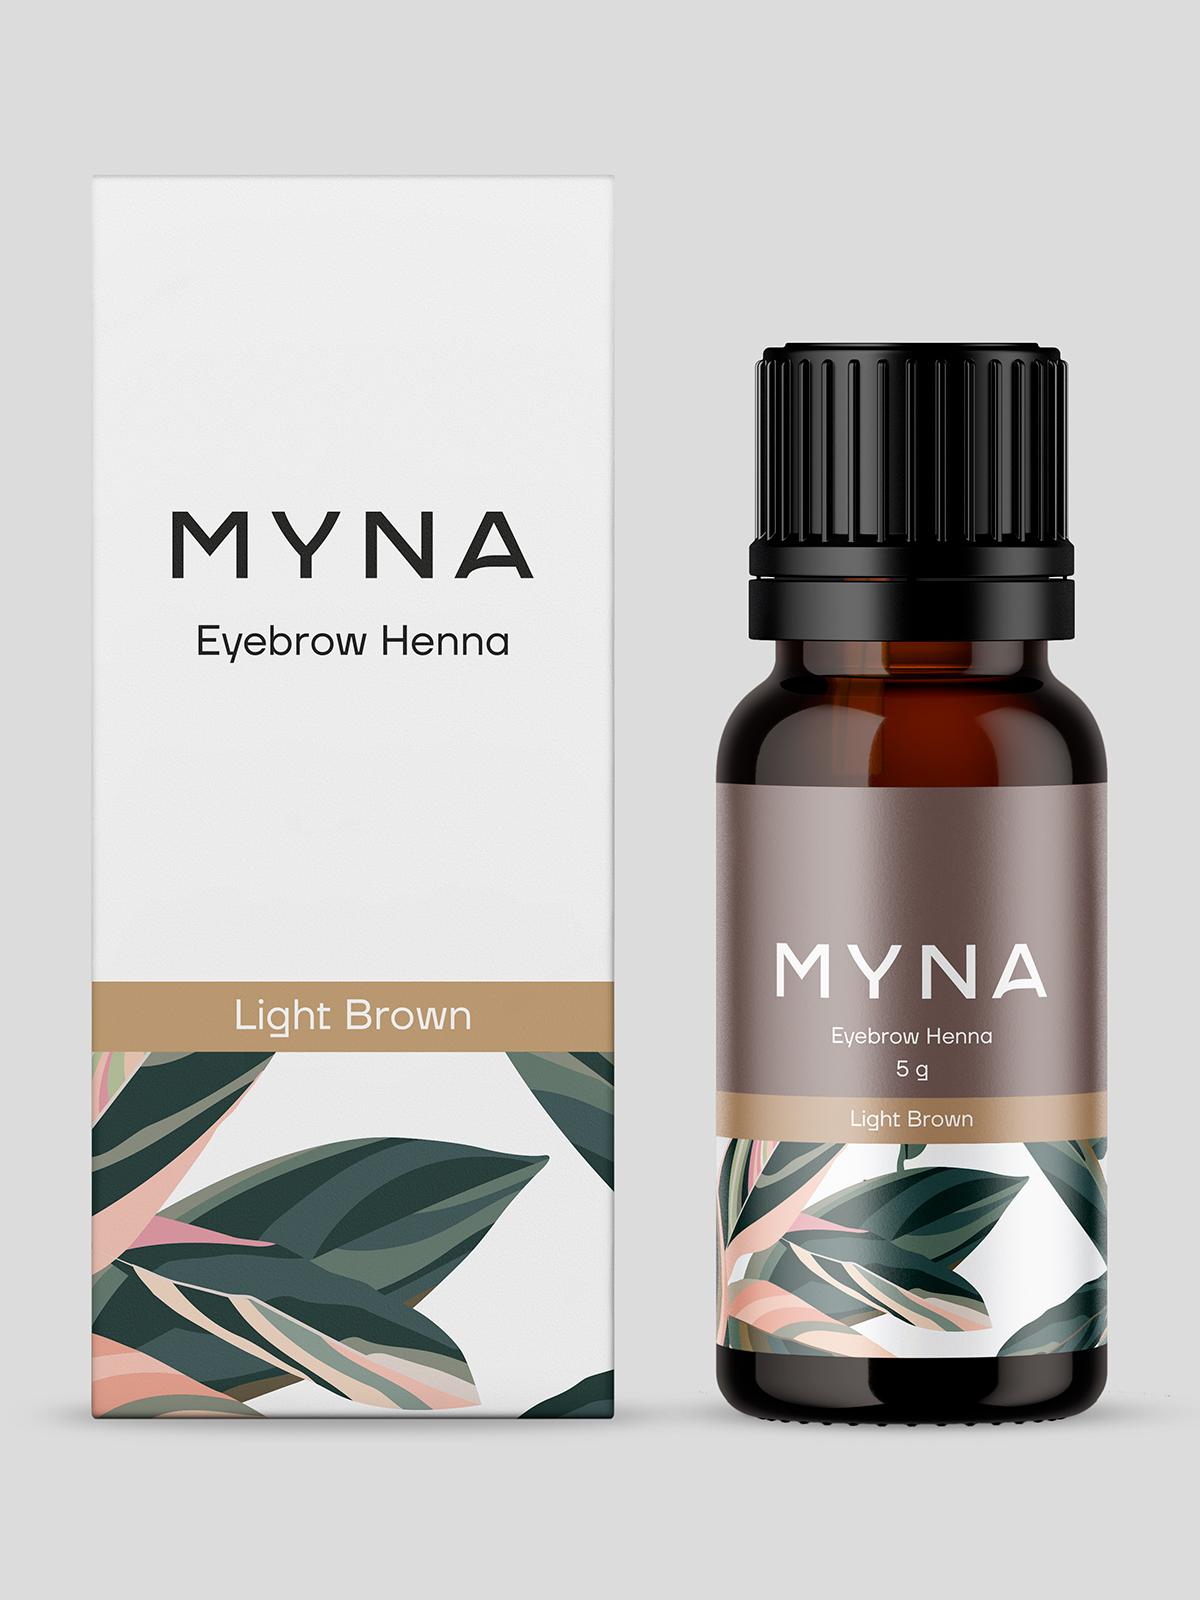 Myna-Henna-Golden_Brown-Visual-Myna-Henna-Light_Brown-Visual-1200x1600px